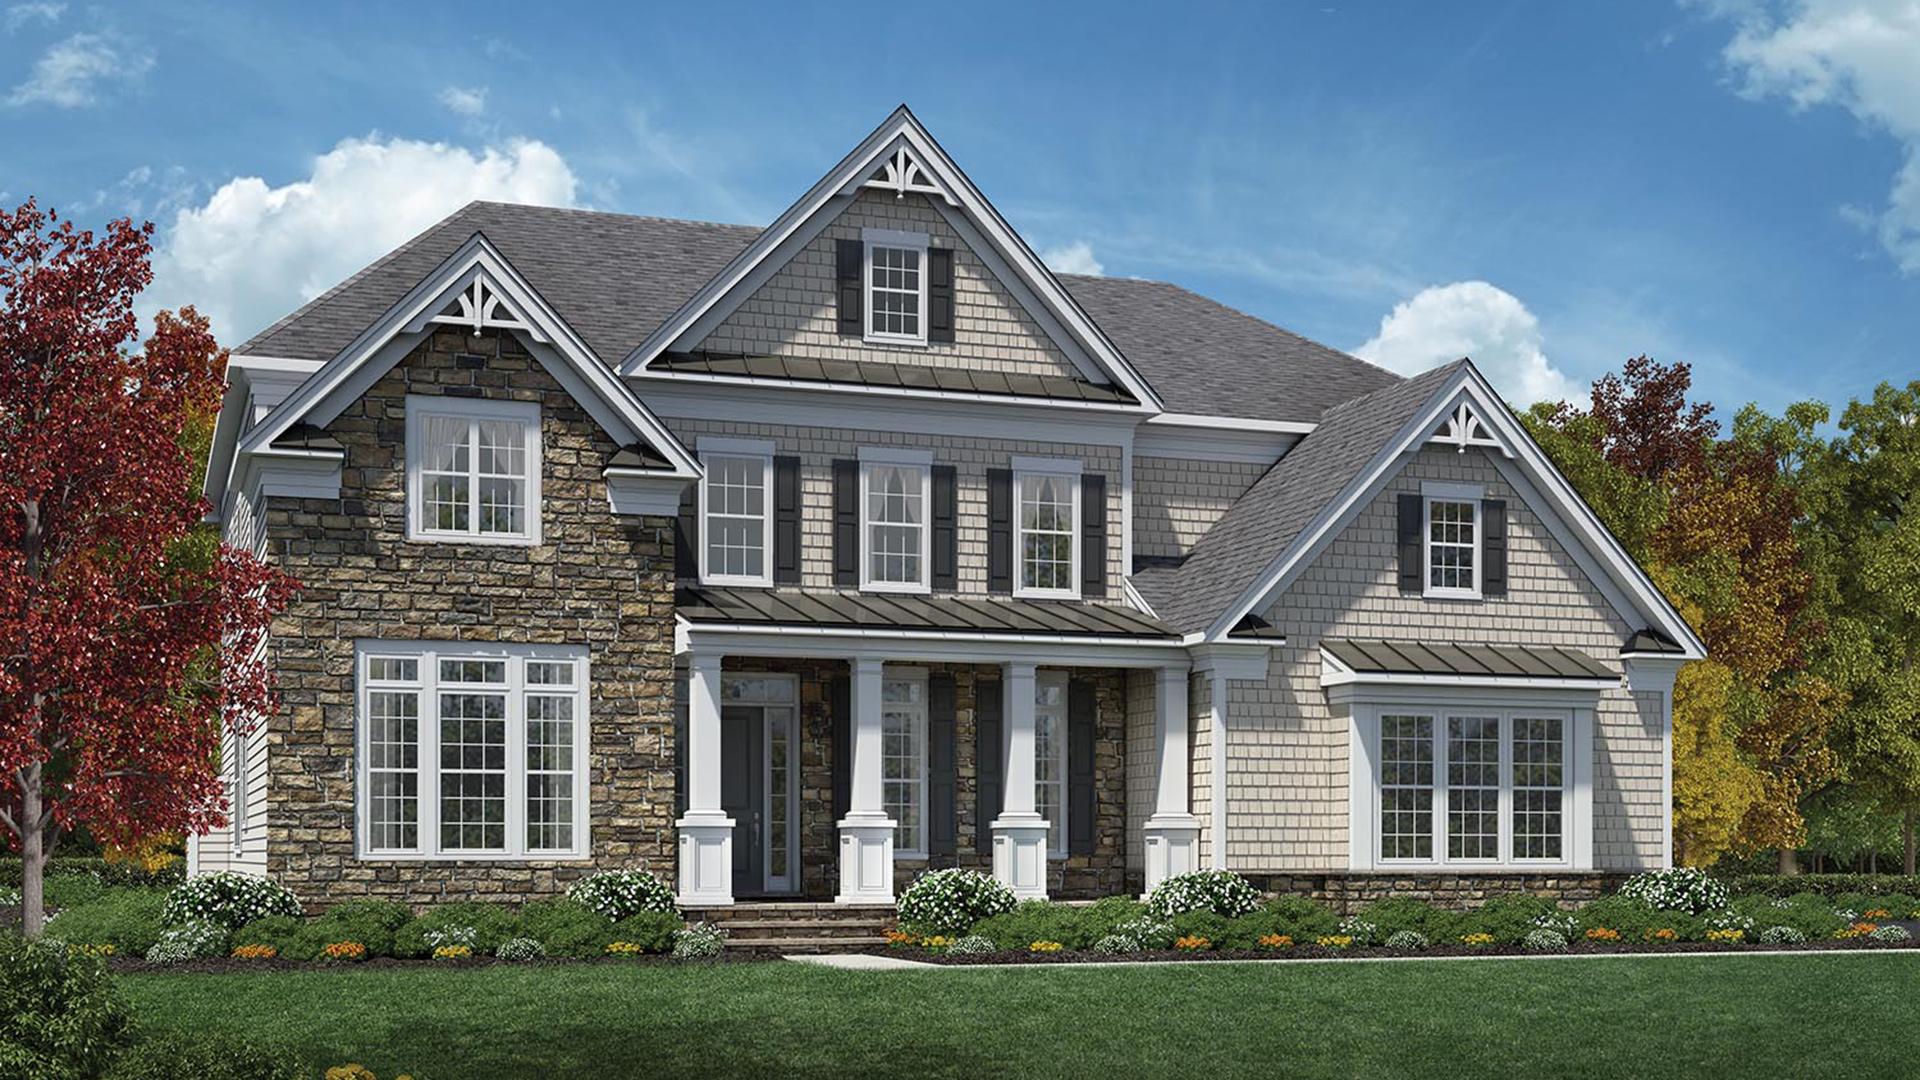 Bamm hollow estates download pdf for Allworth home designs